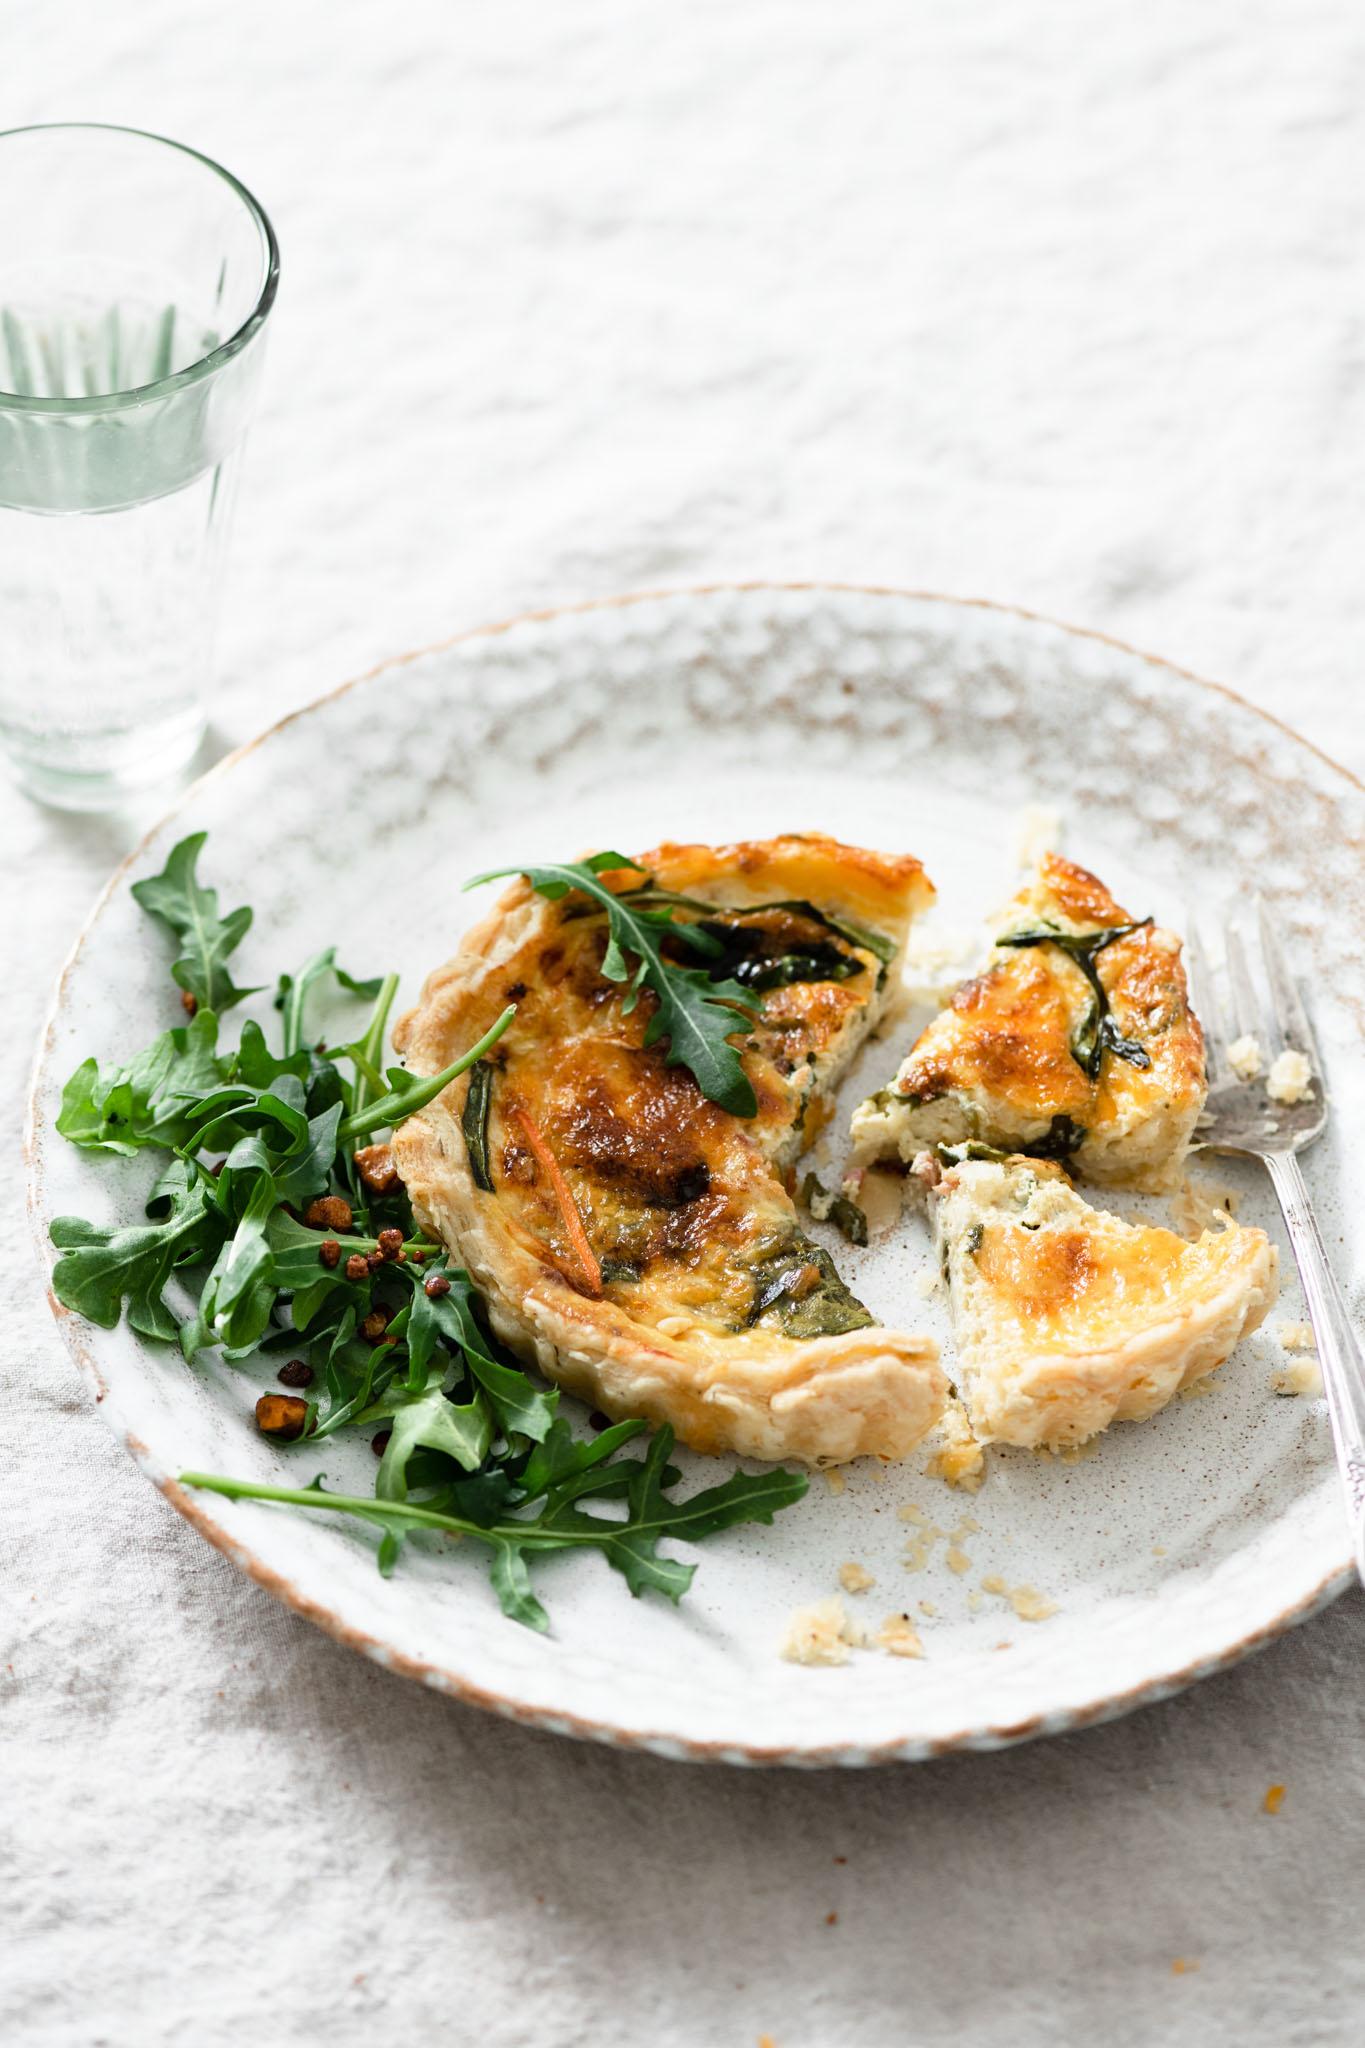 Breakfast quiche with an arugula salad.